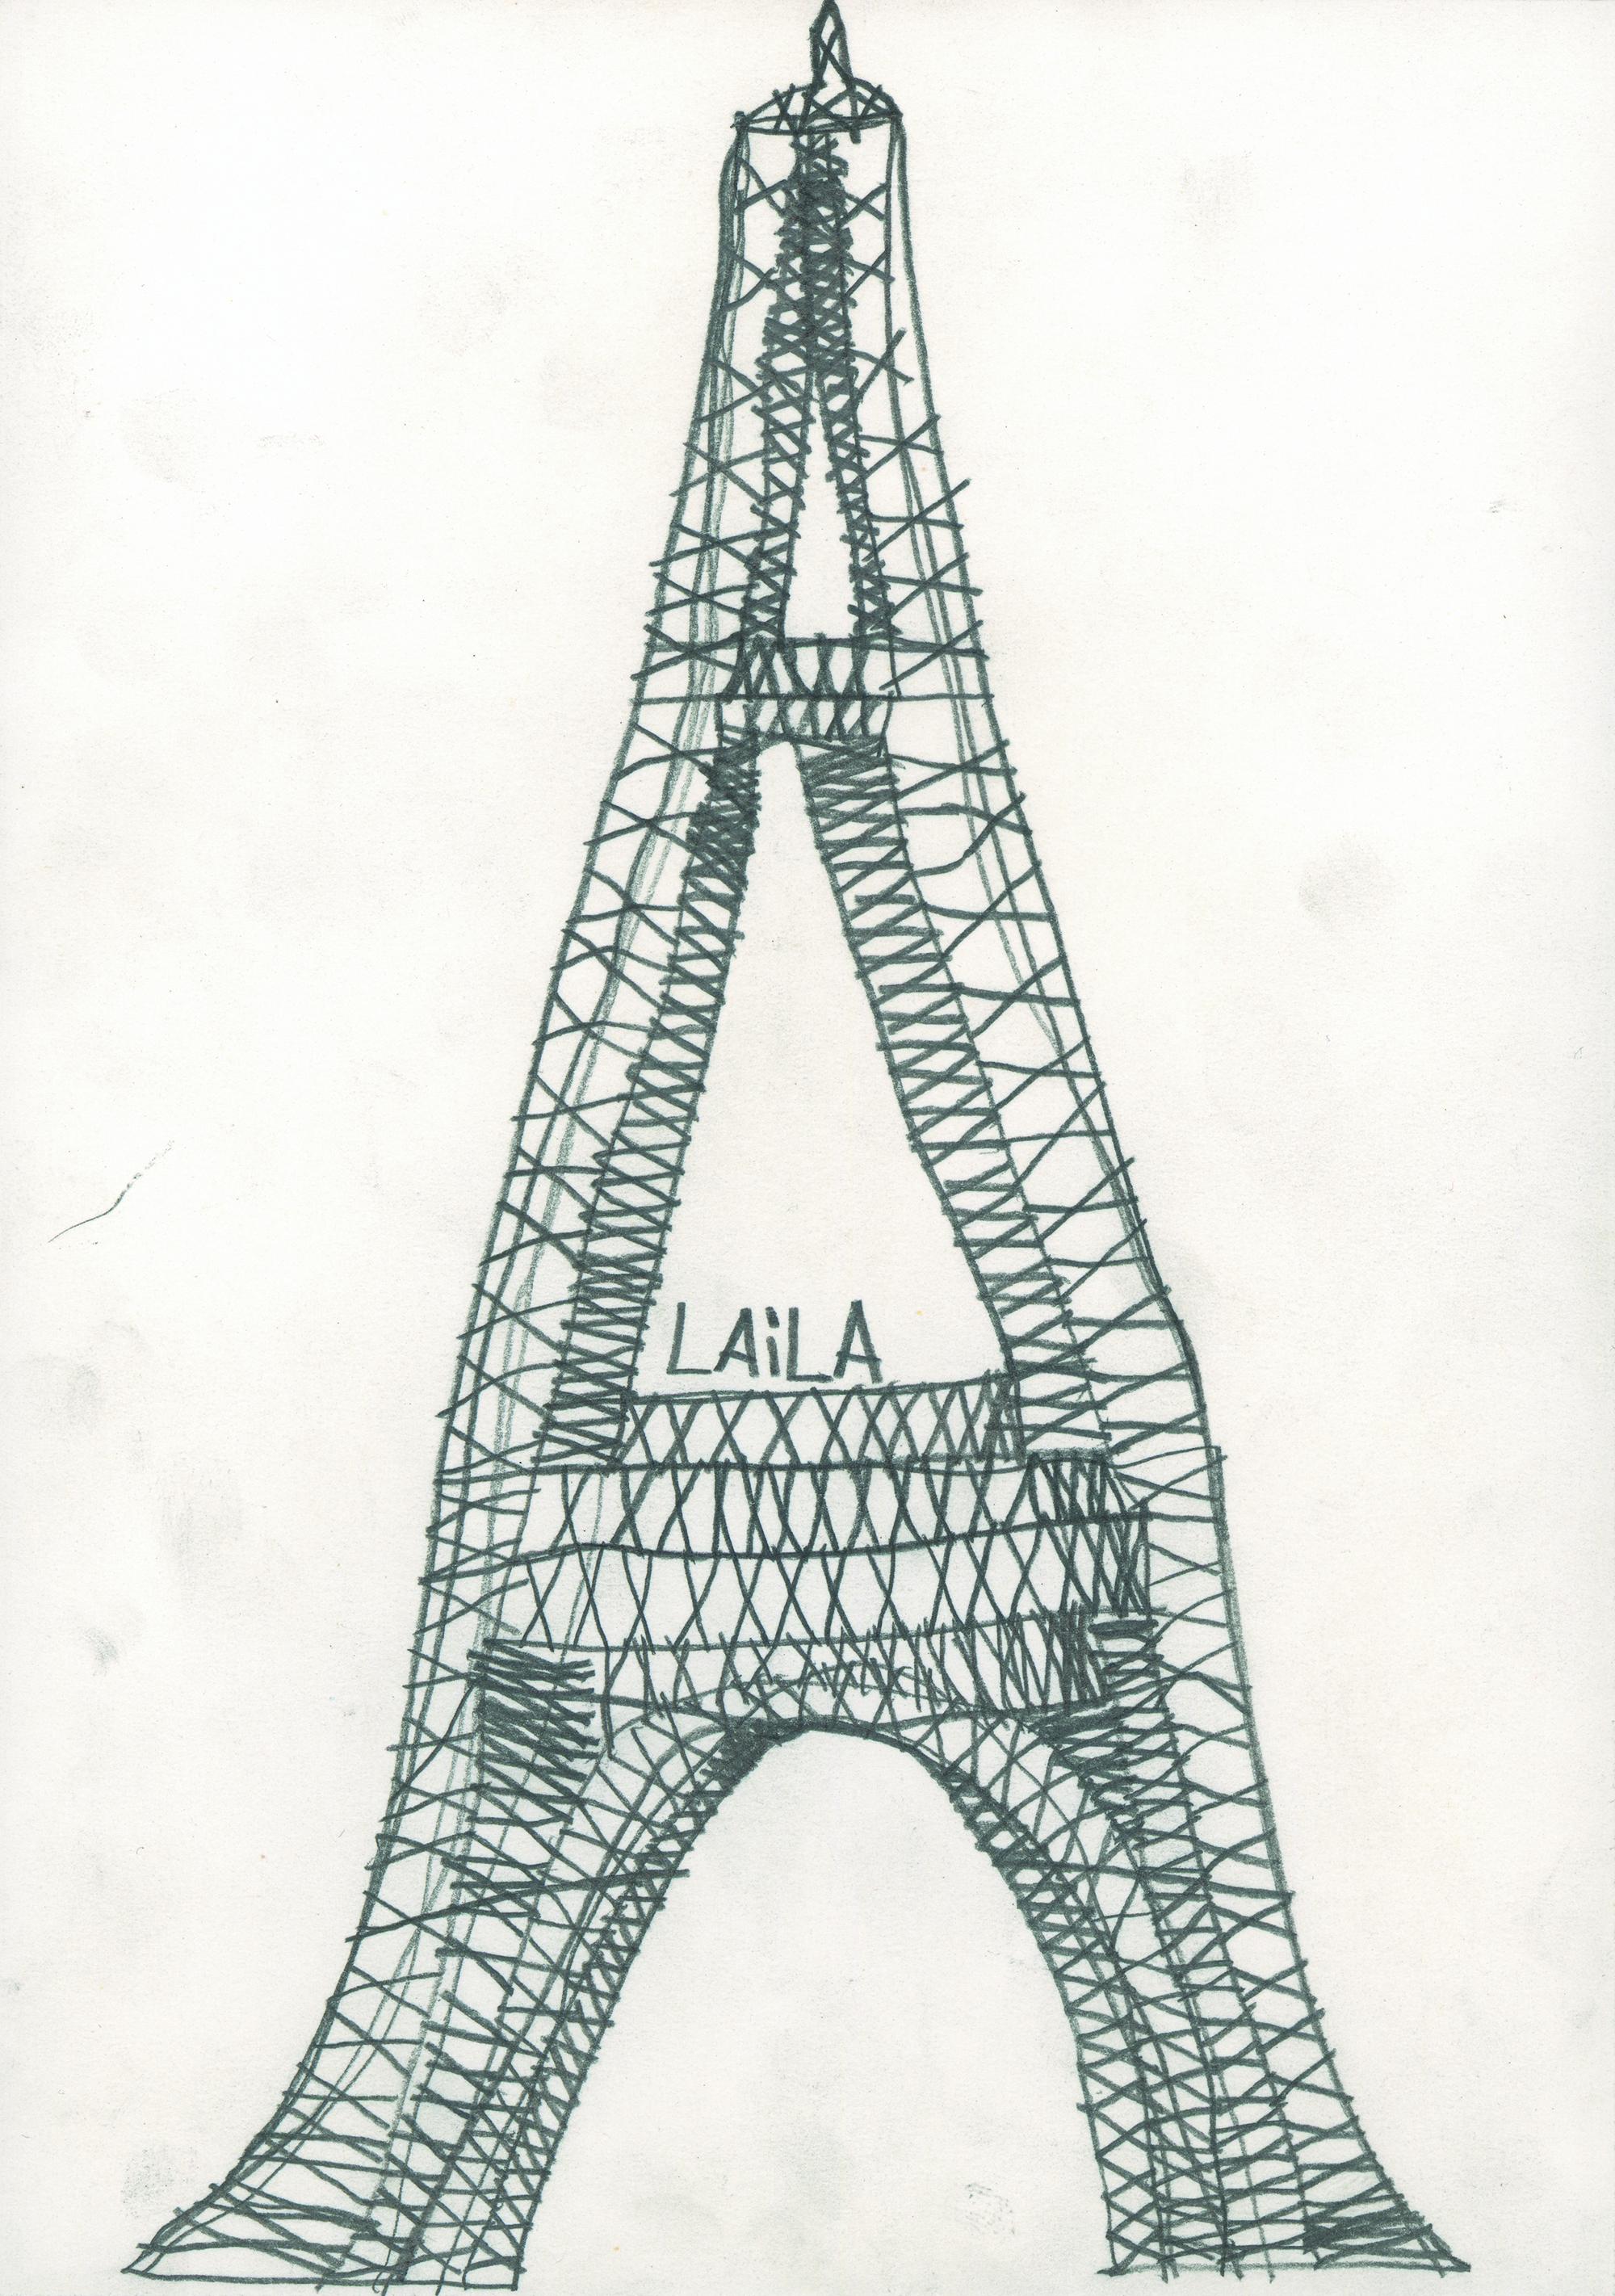 Laila Bachtiar, Eiffelturm, 1992 © galerie gugging